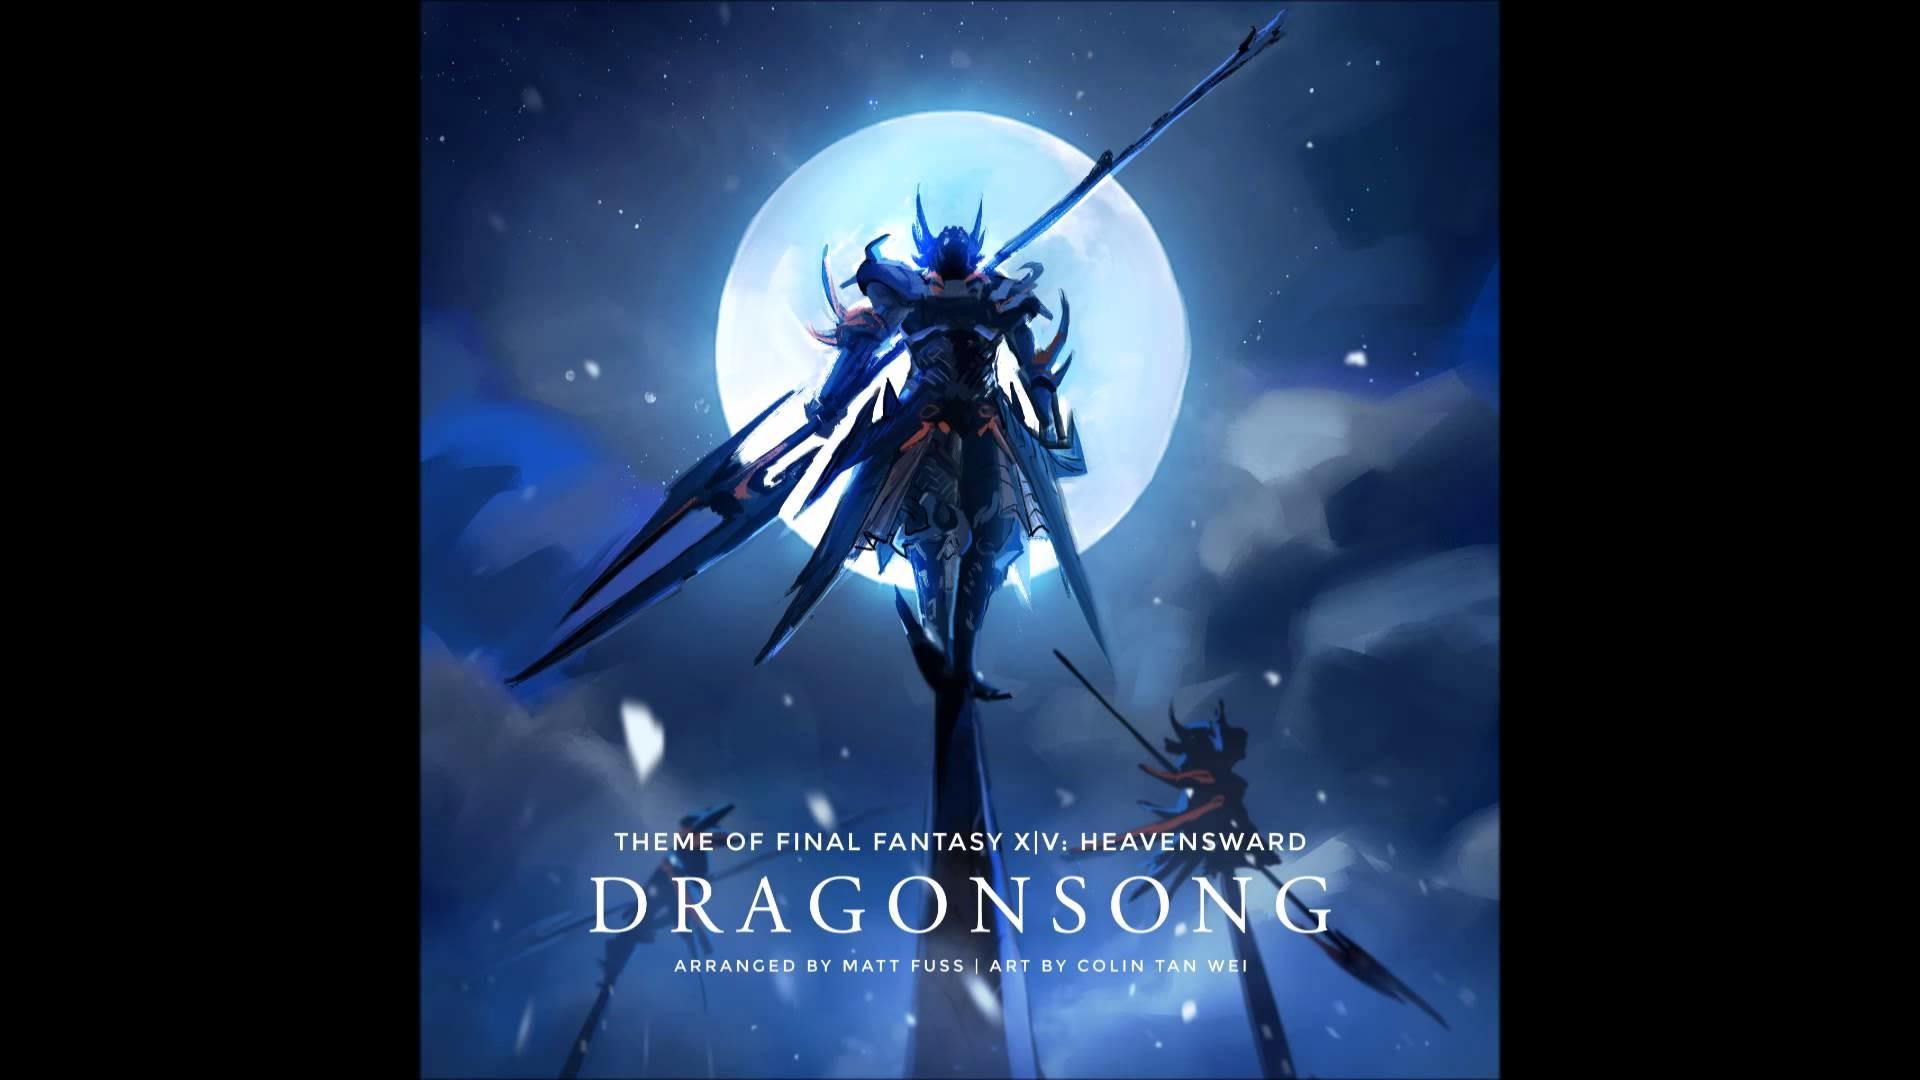 [Piano Solo] 'Dragonsong' (Main Theme of Final Fantasy XIV: Heavensward)